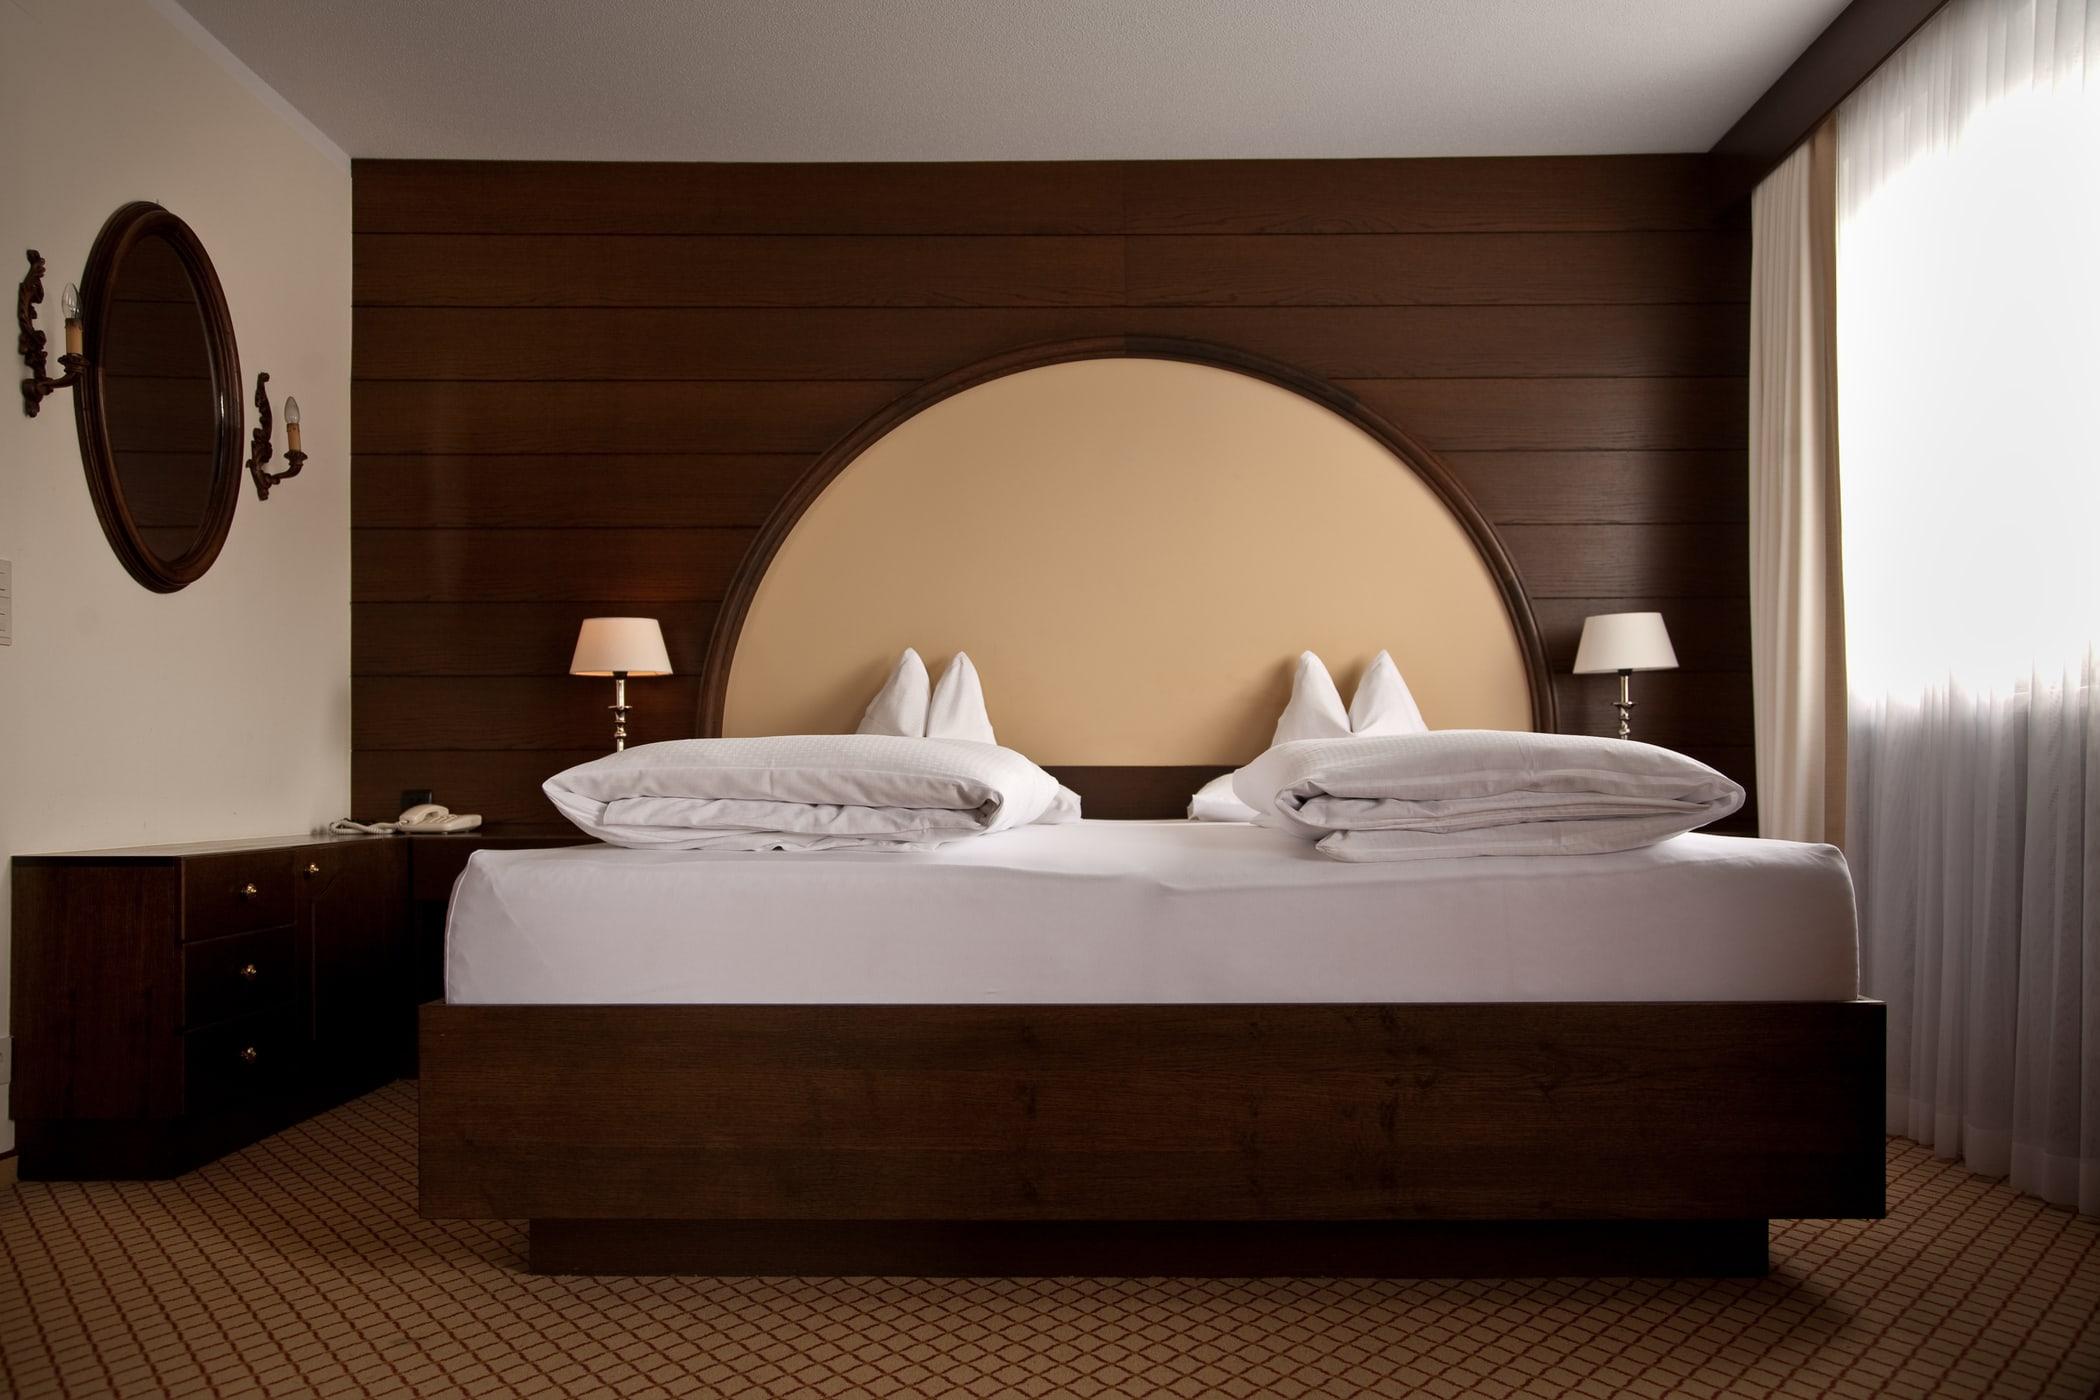 zimmer-kategorien-3-old-style-chick-hotel-flexen-zuers-am-arlberg